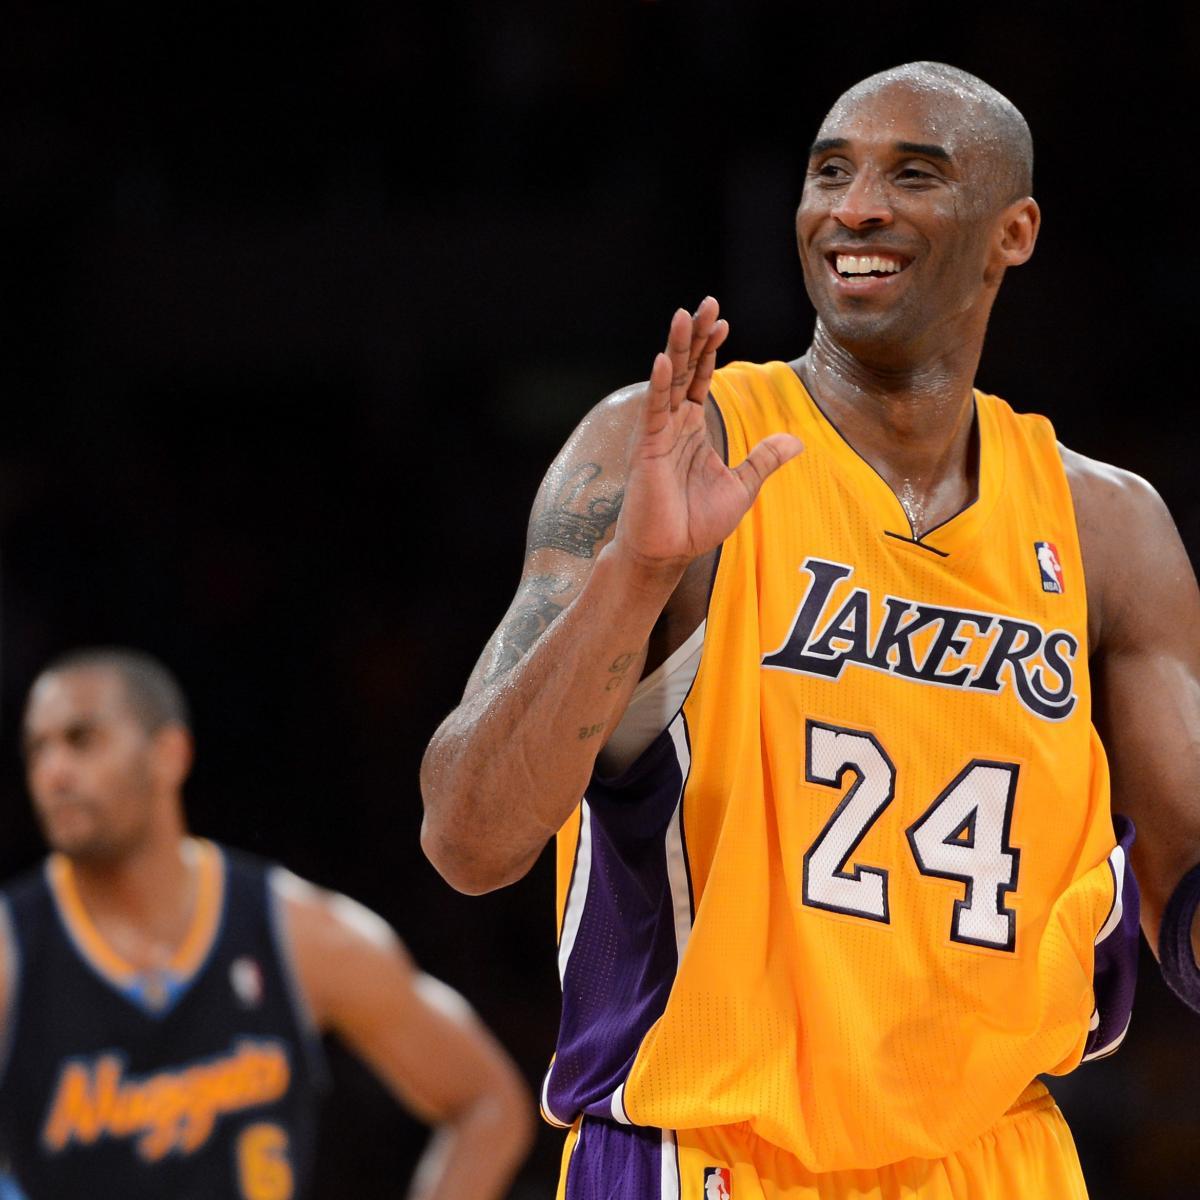 Miami Heat Las Vegas Favorite For 2013 NBA Title, But LA